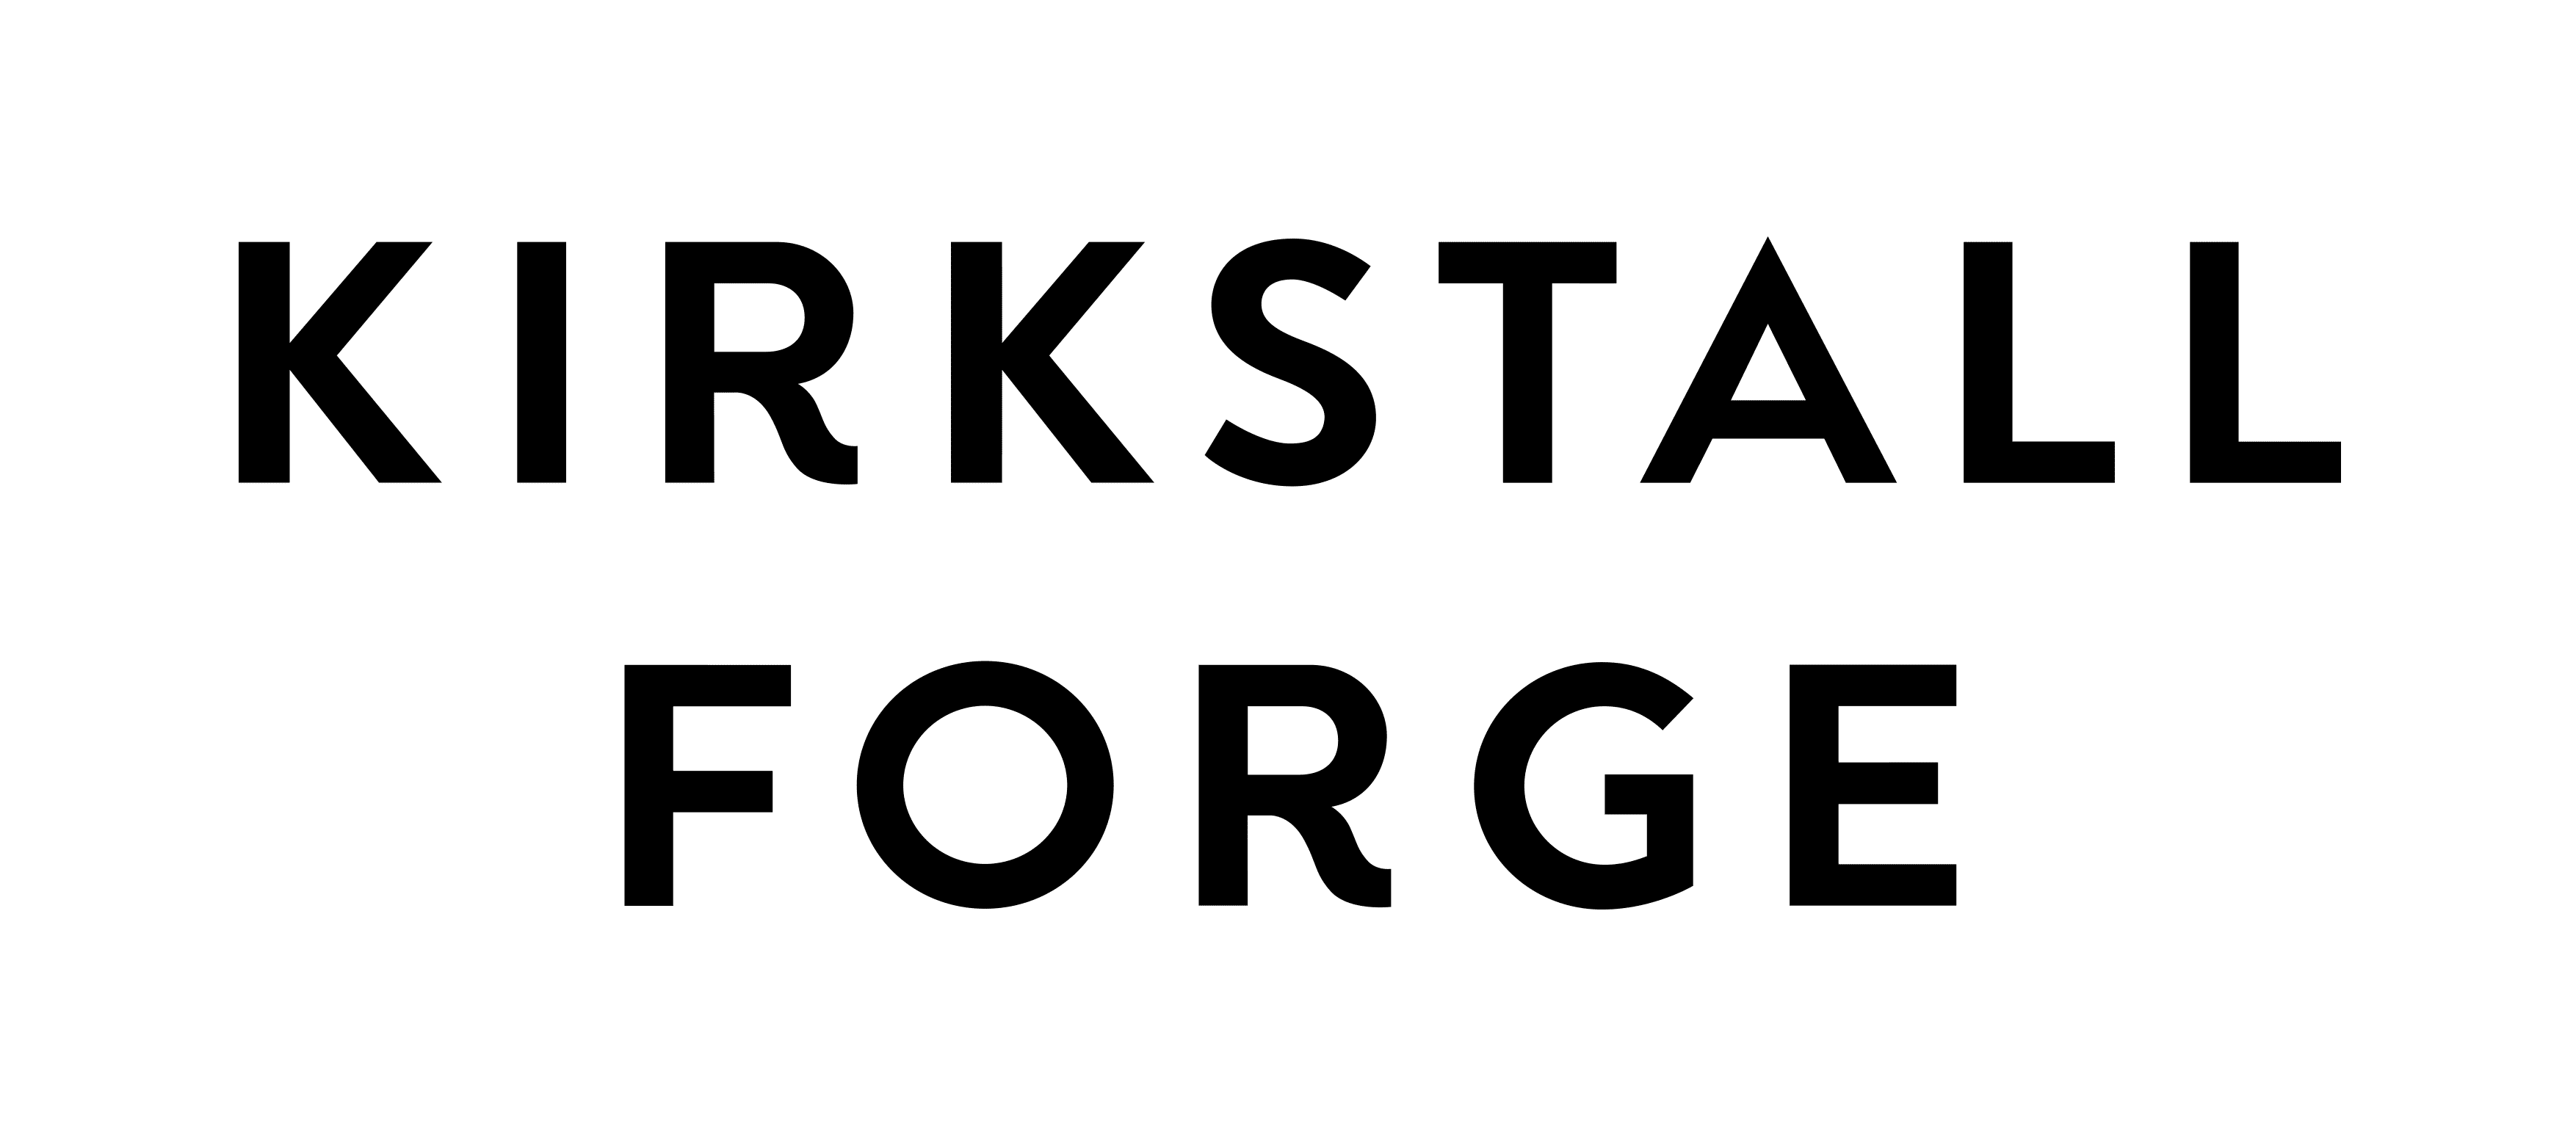 Kirkstall Forge